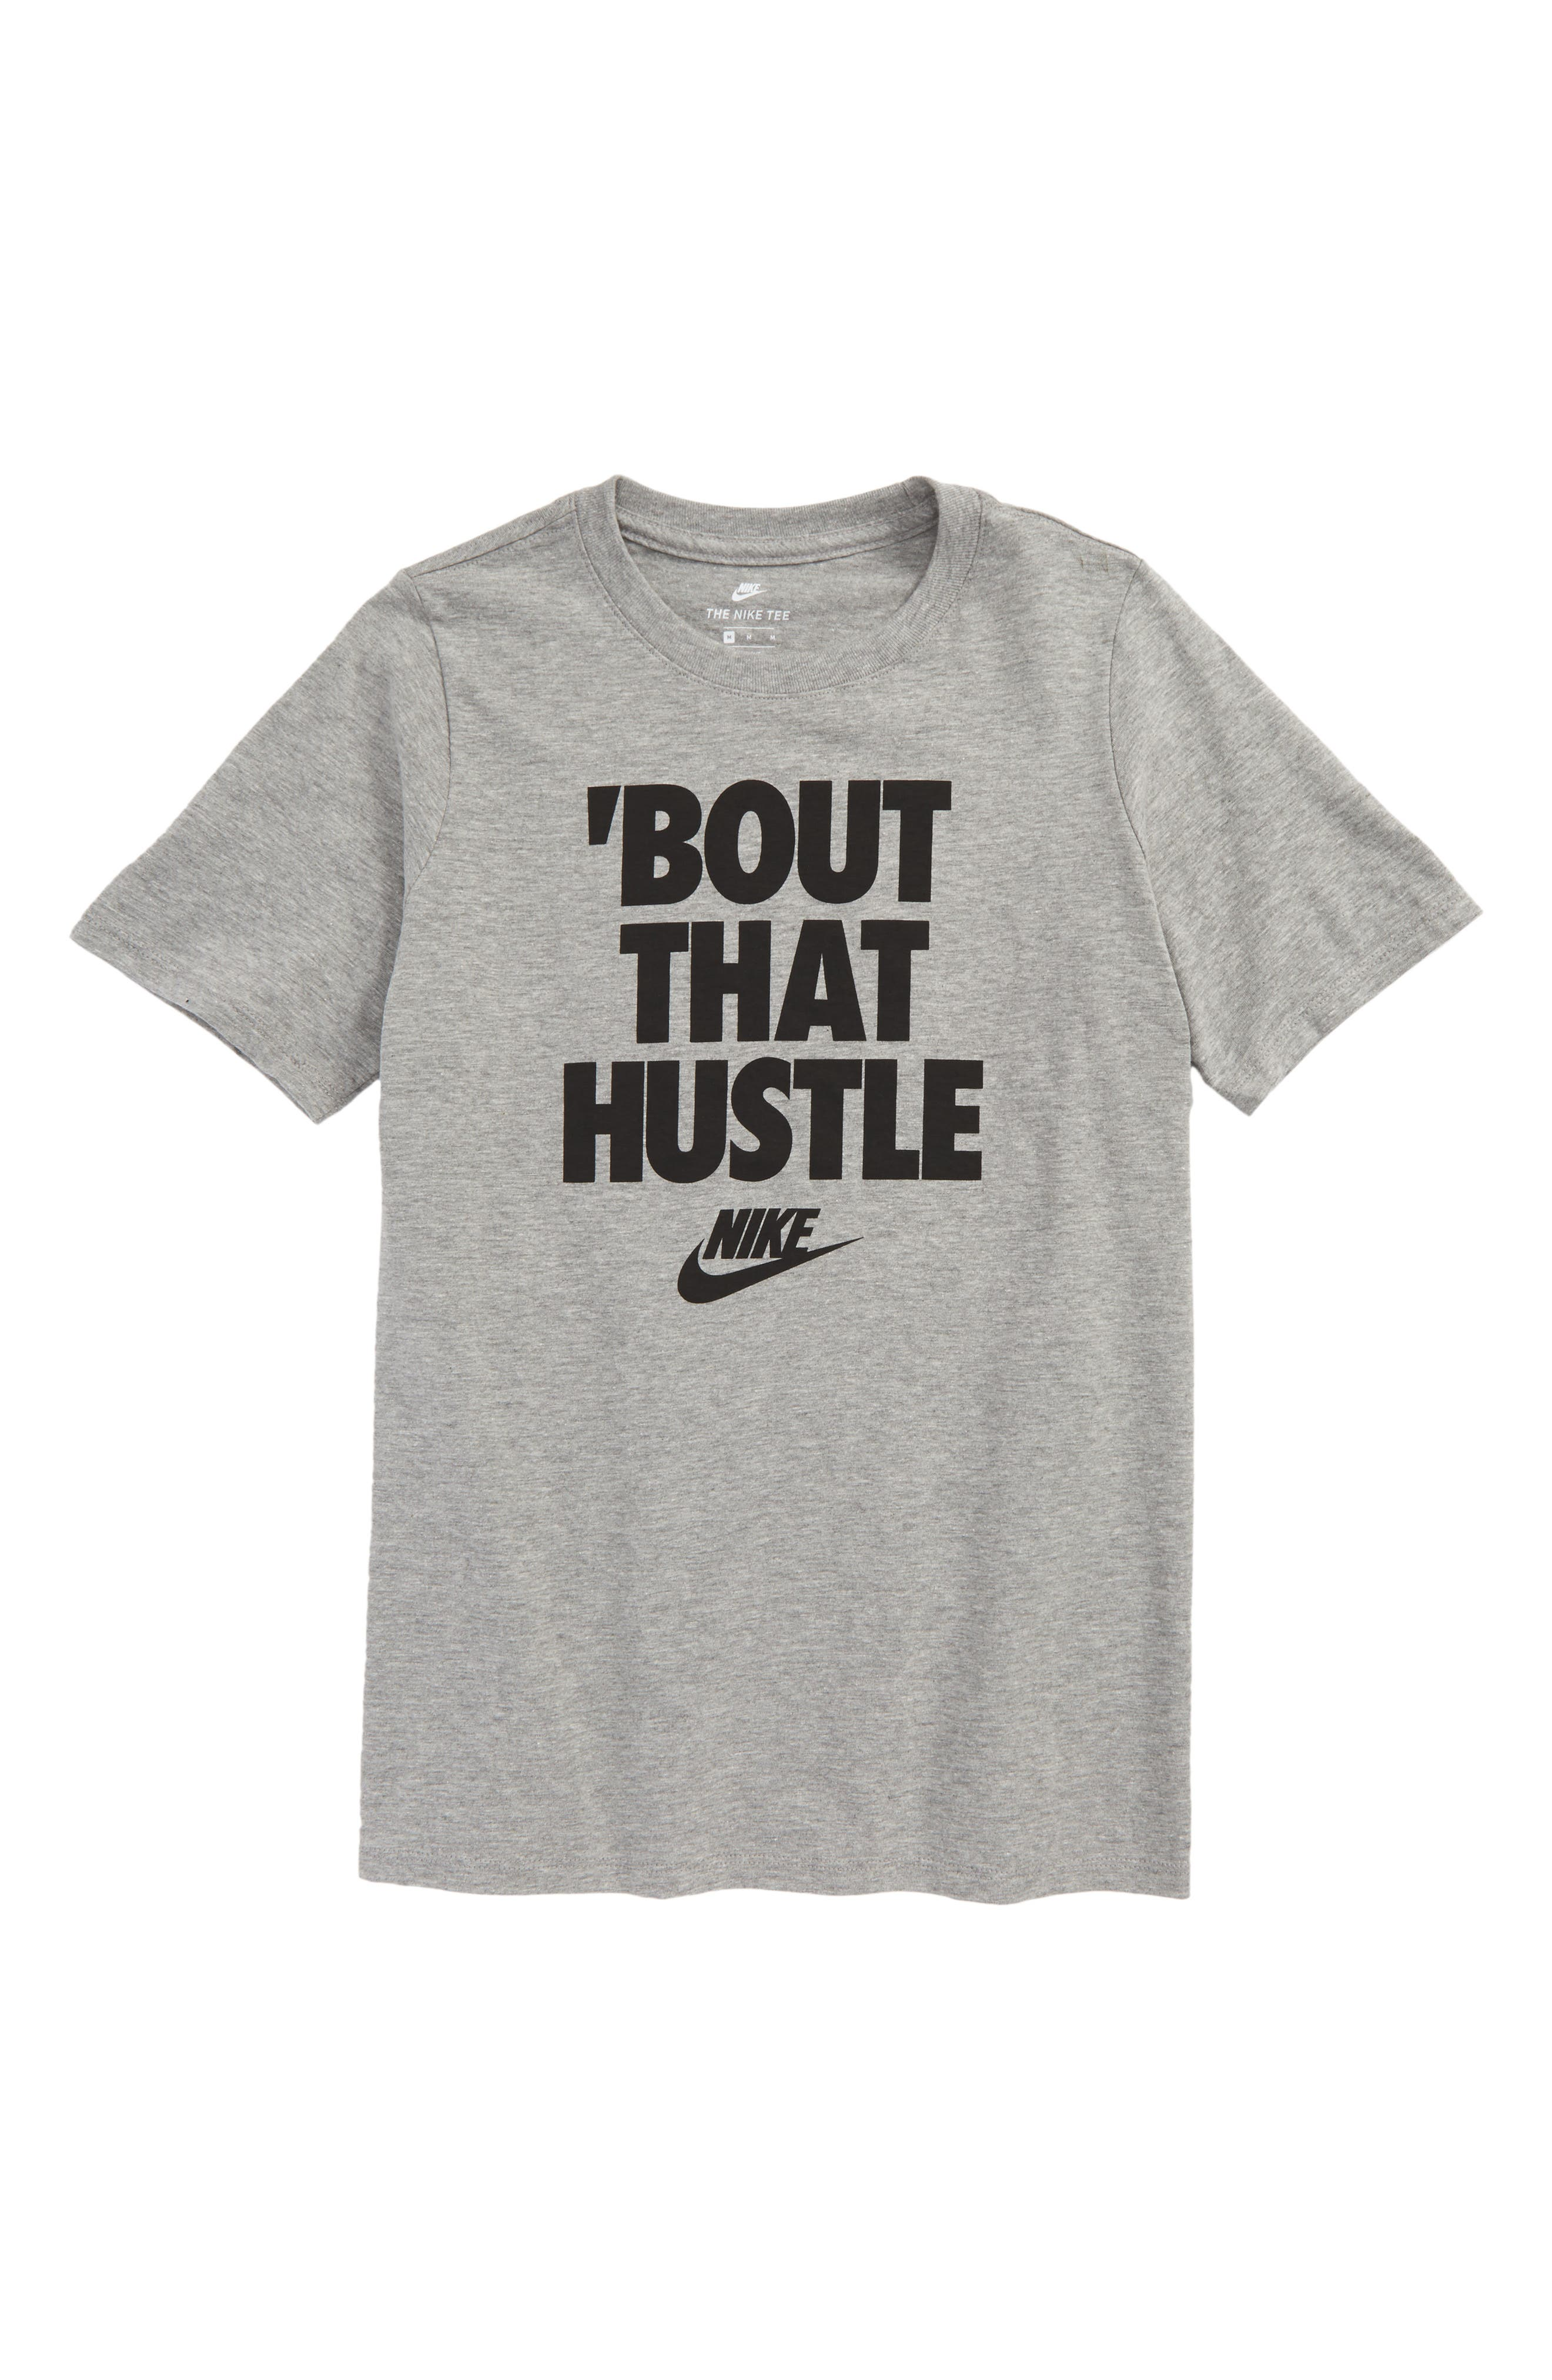 Nike Hustle Graphic T-Shirt (Little Boys \u0026 Big Boys)